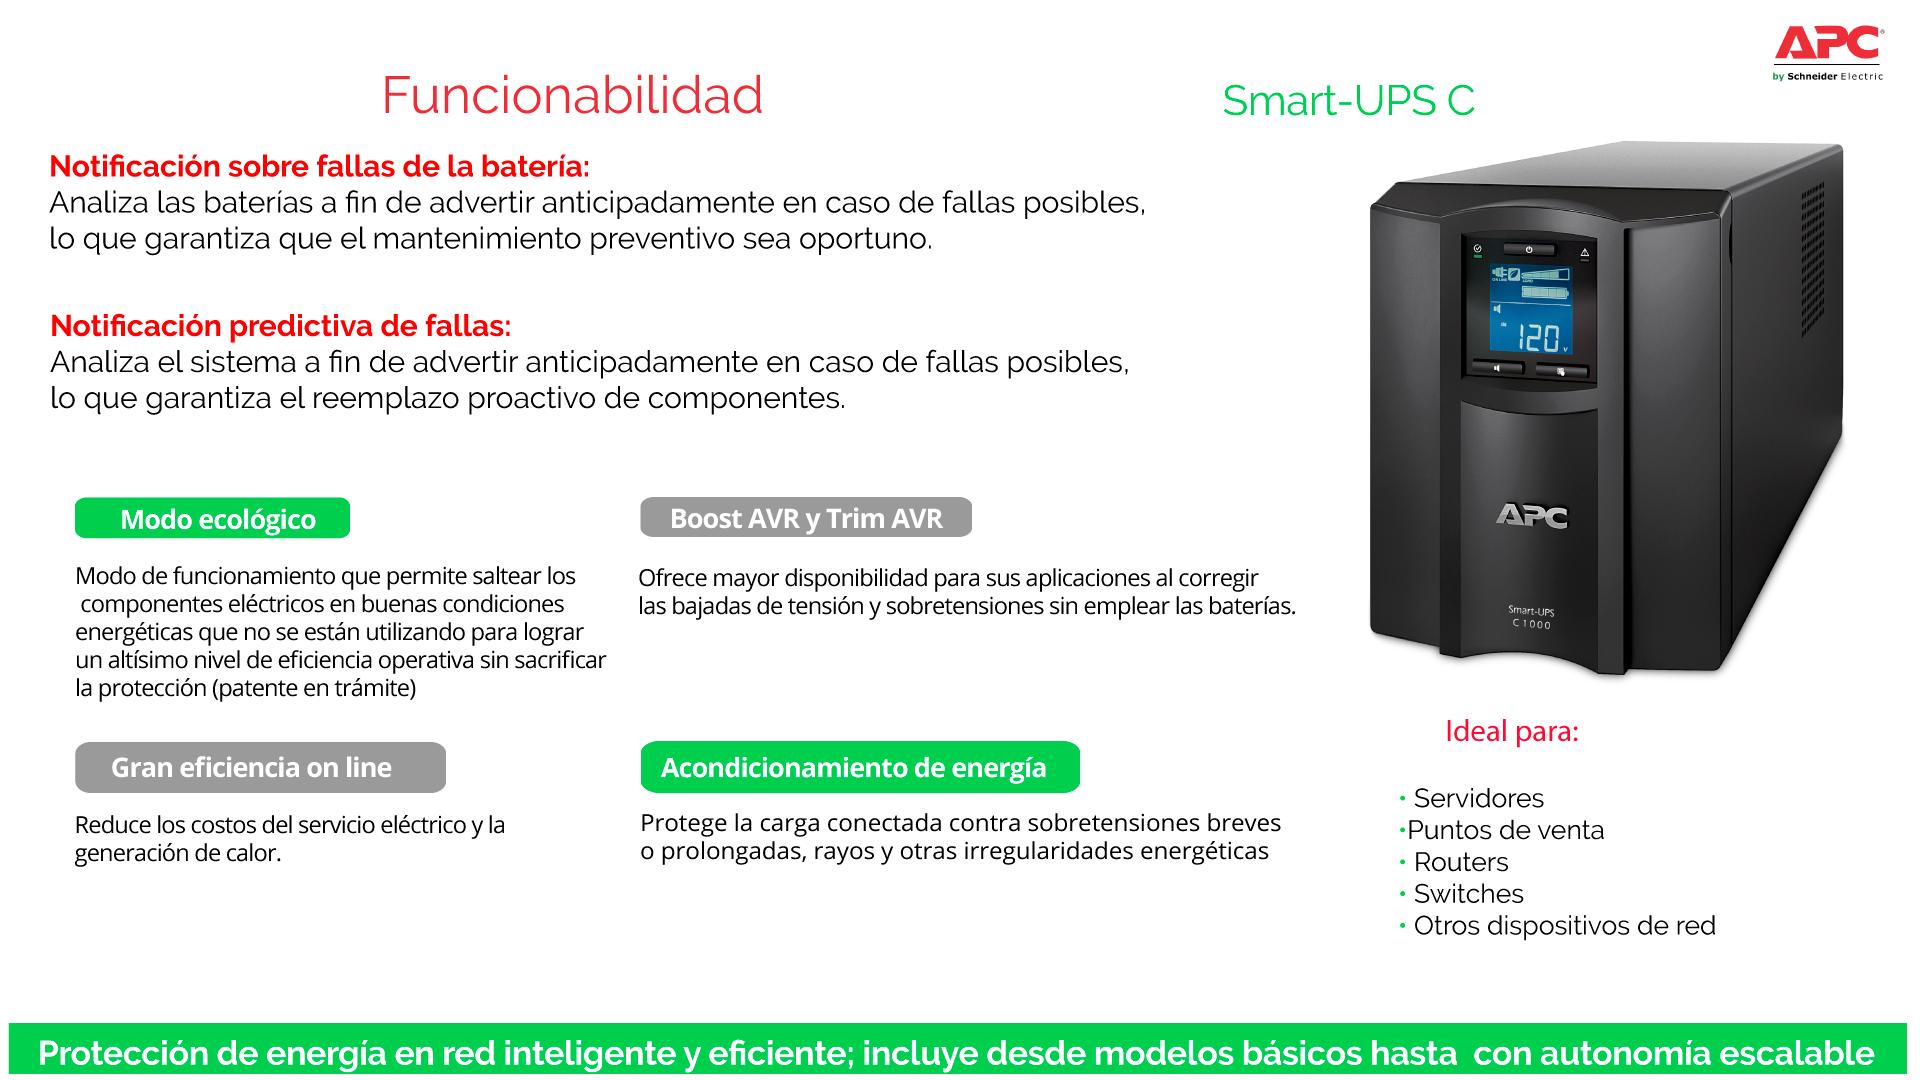 smartups Sc